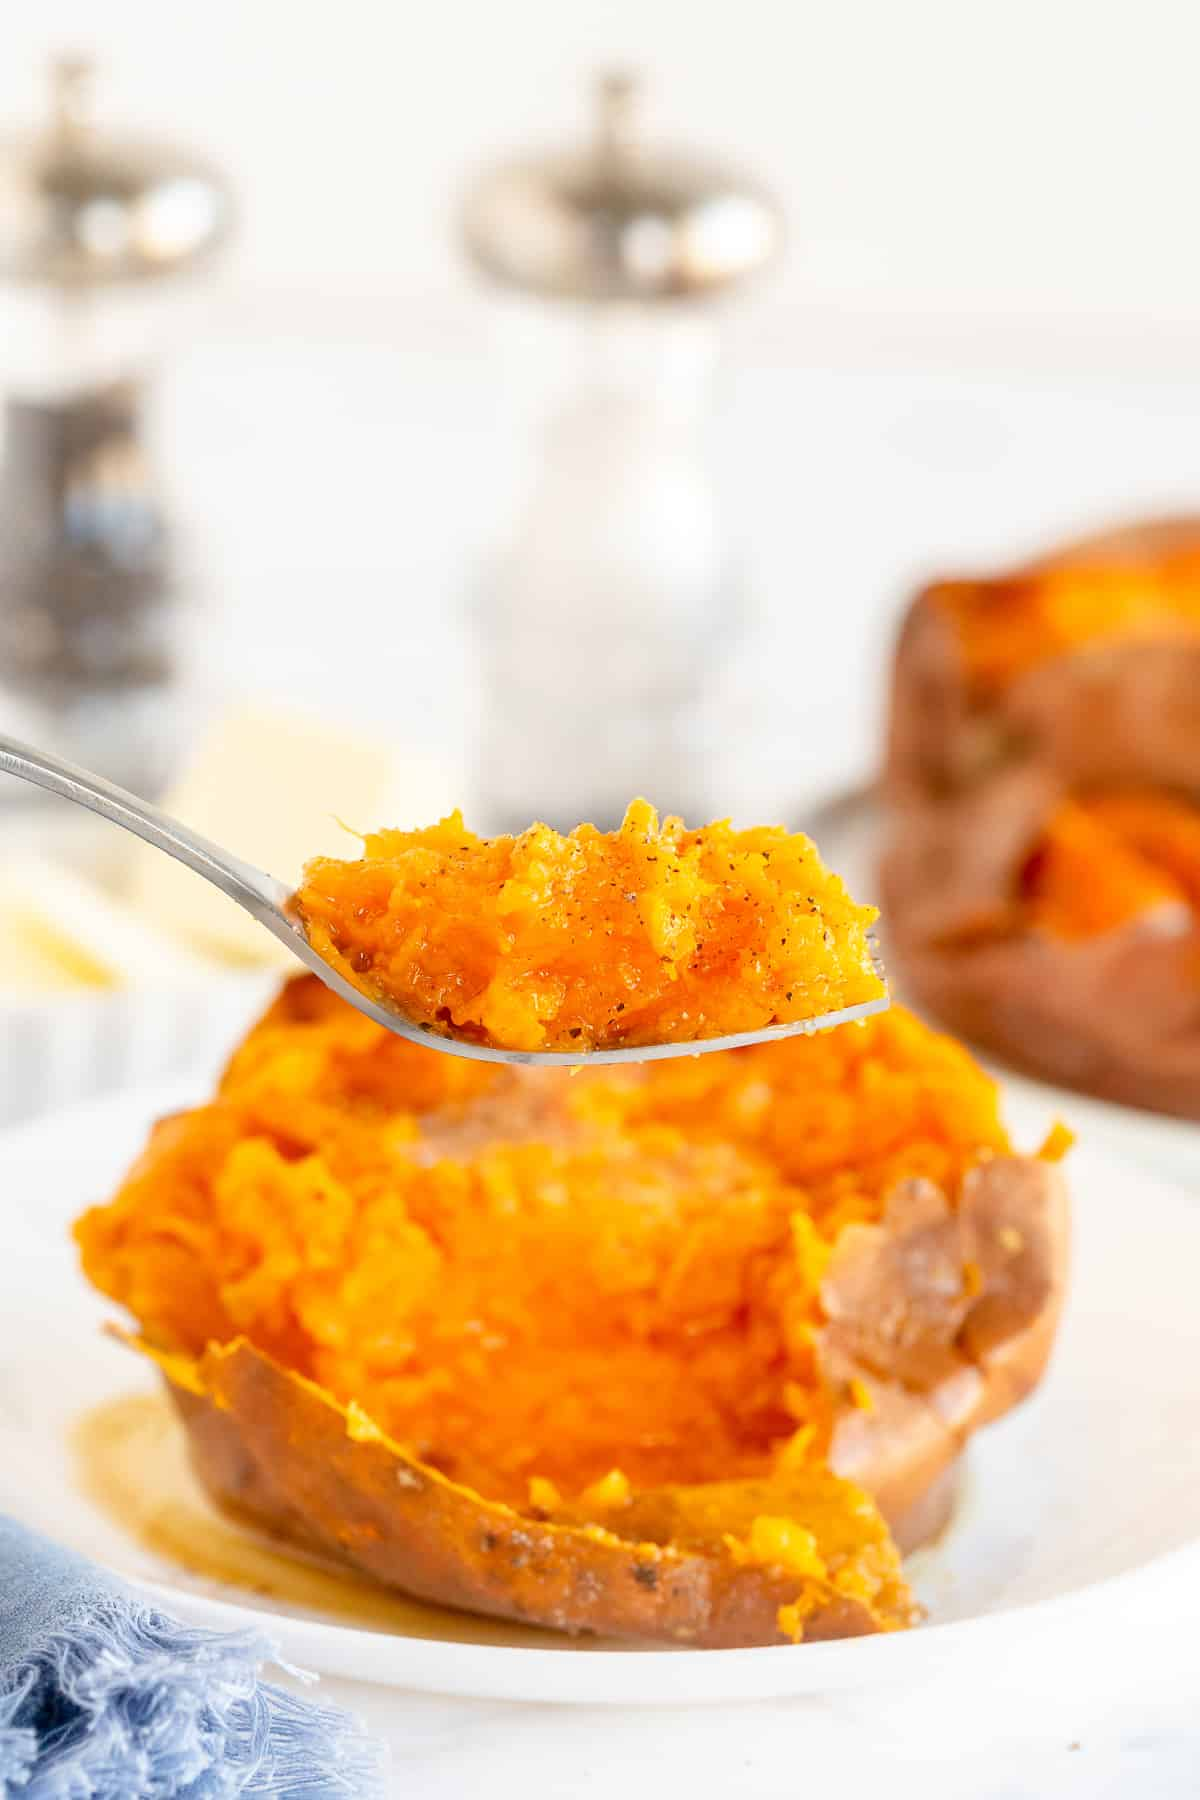 A fork lifts a bite of sweet potato.